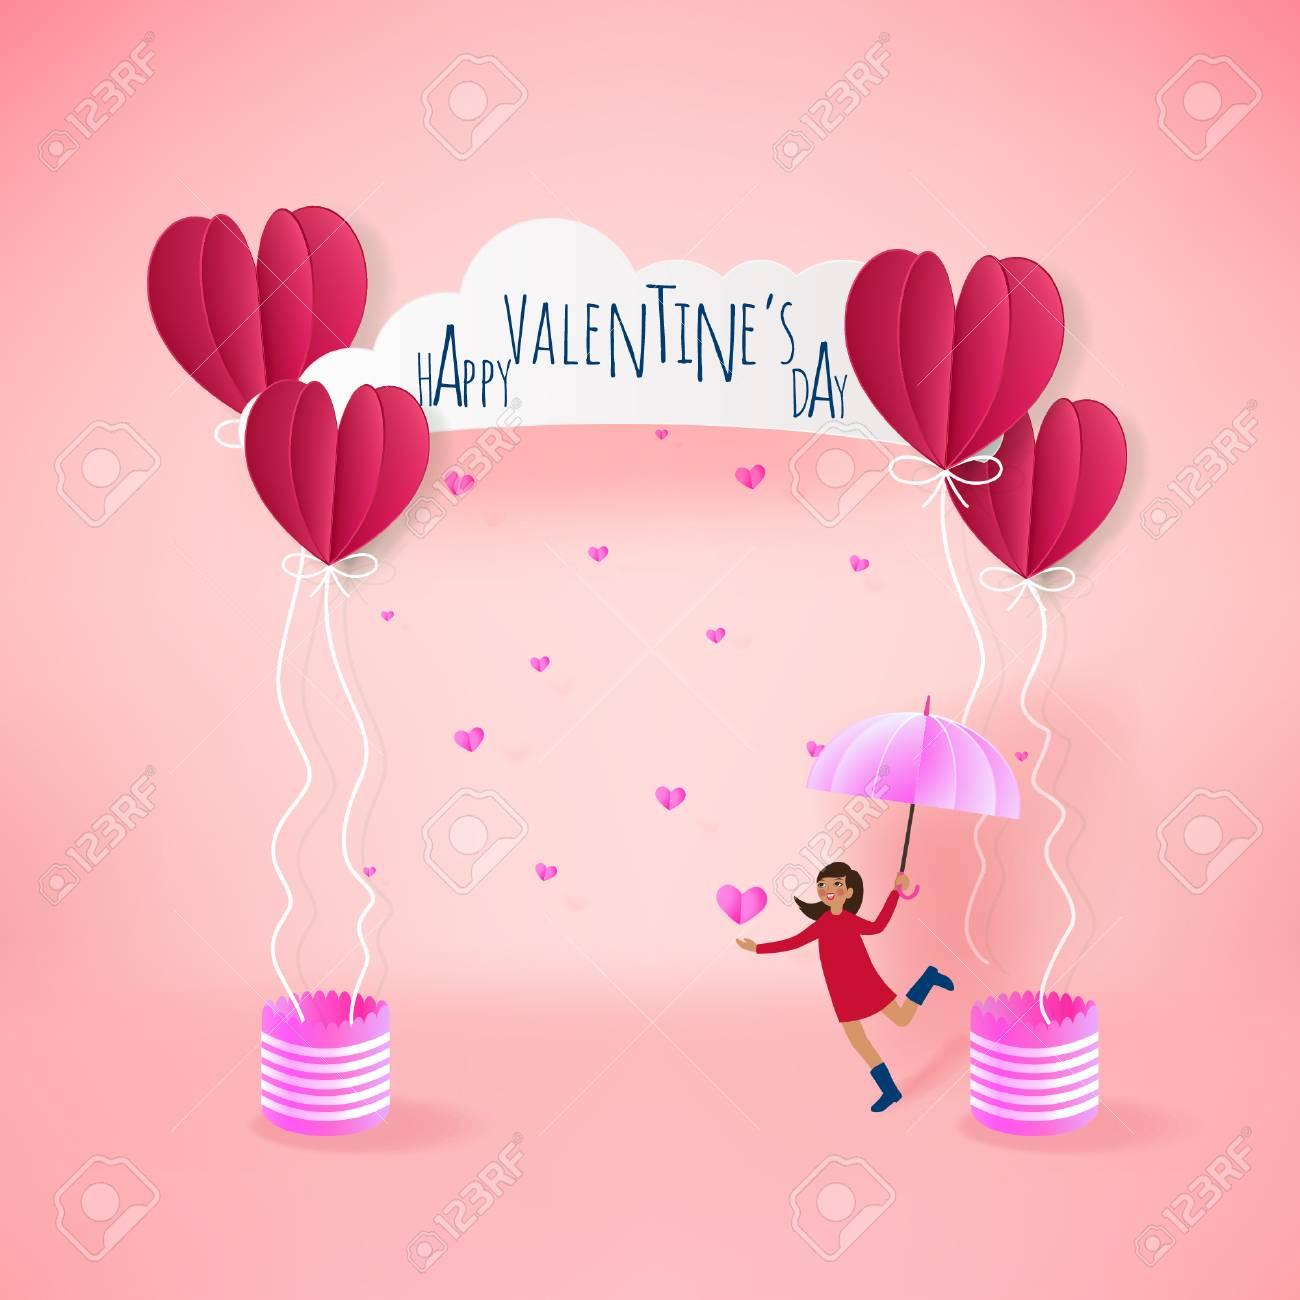 Love Invitation Card Valentine S Day Balloon Heart On Pink Background